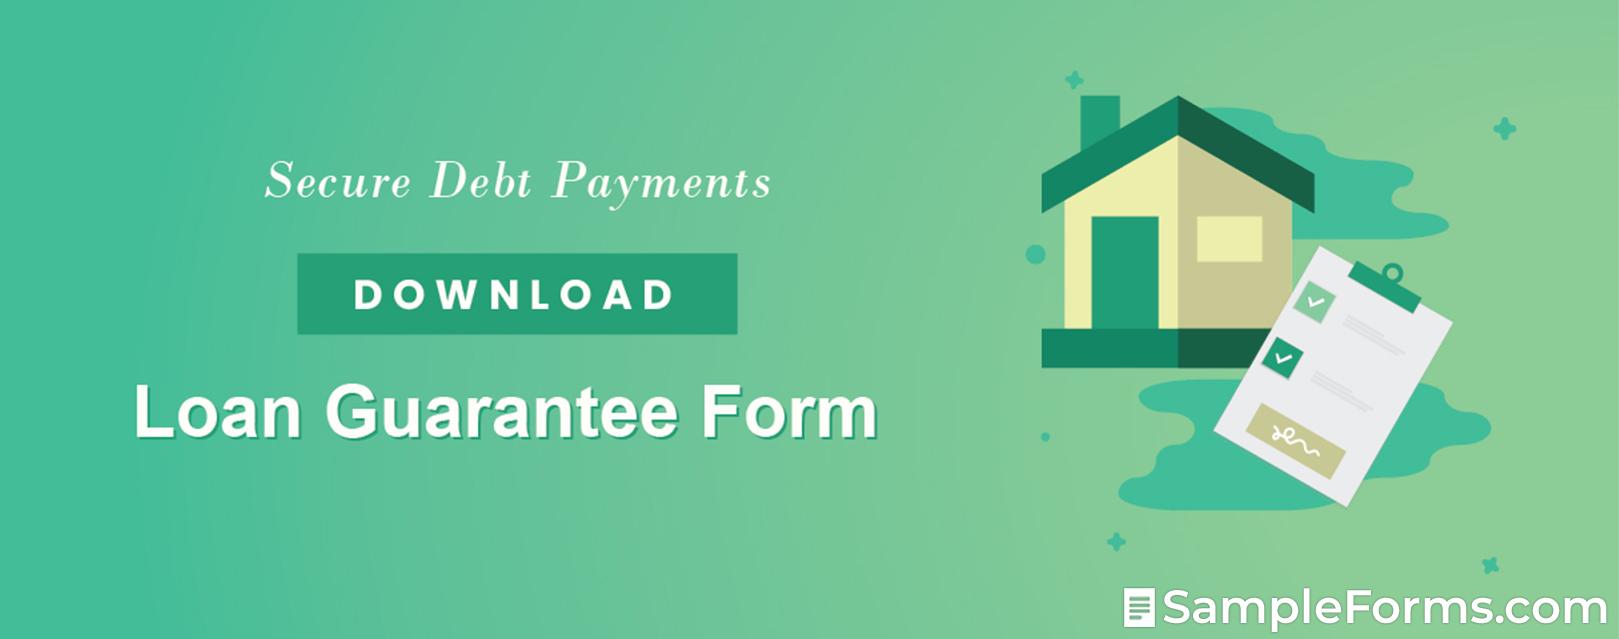 Loan Guarantee Form